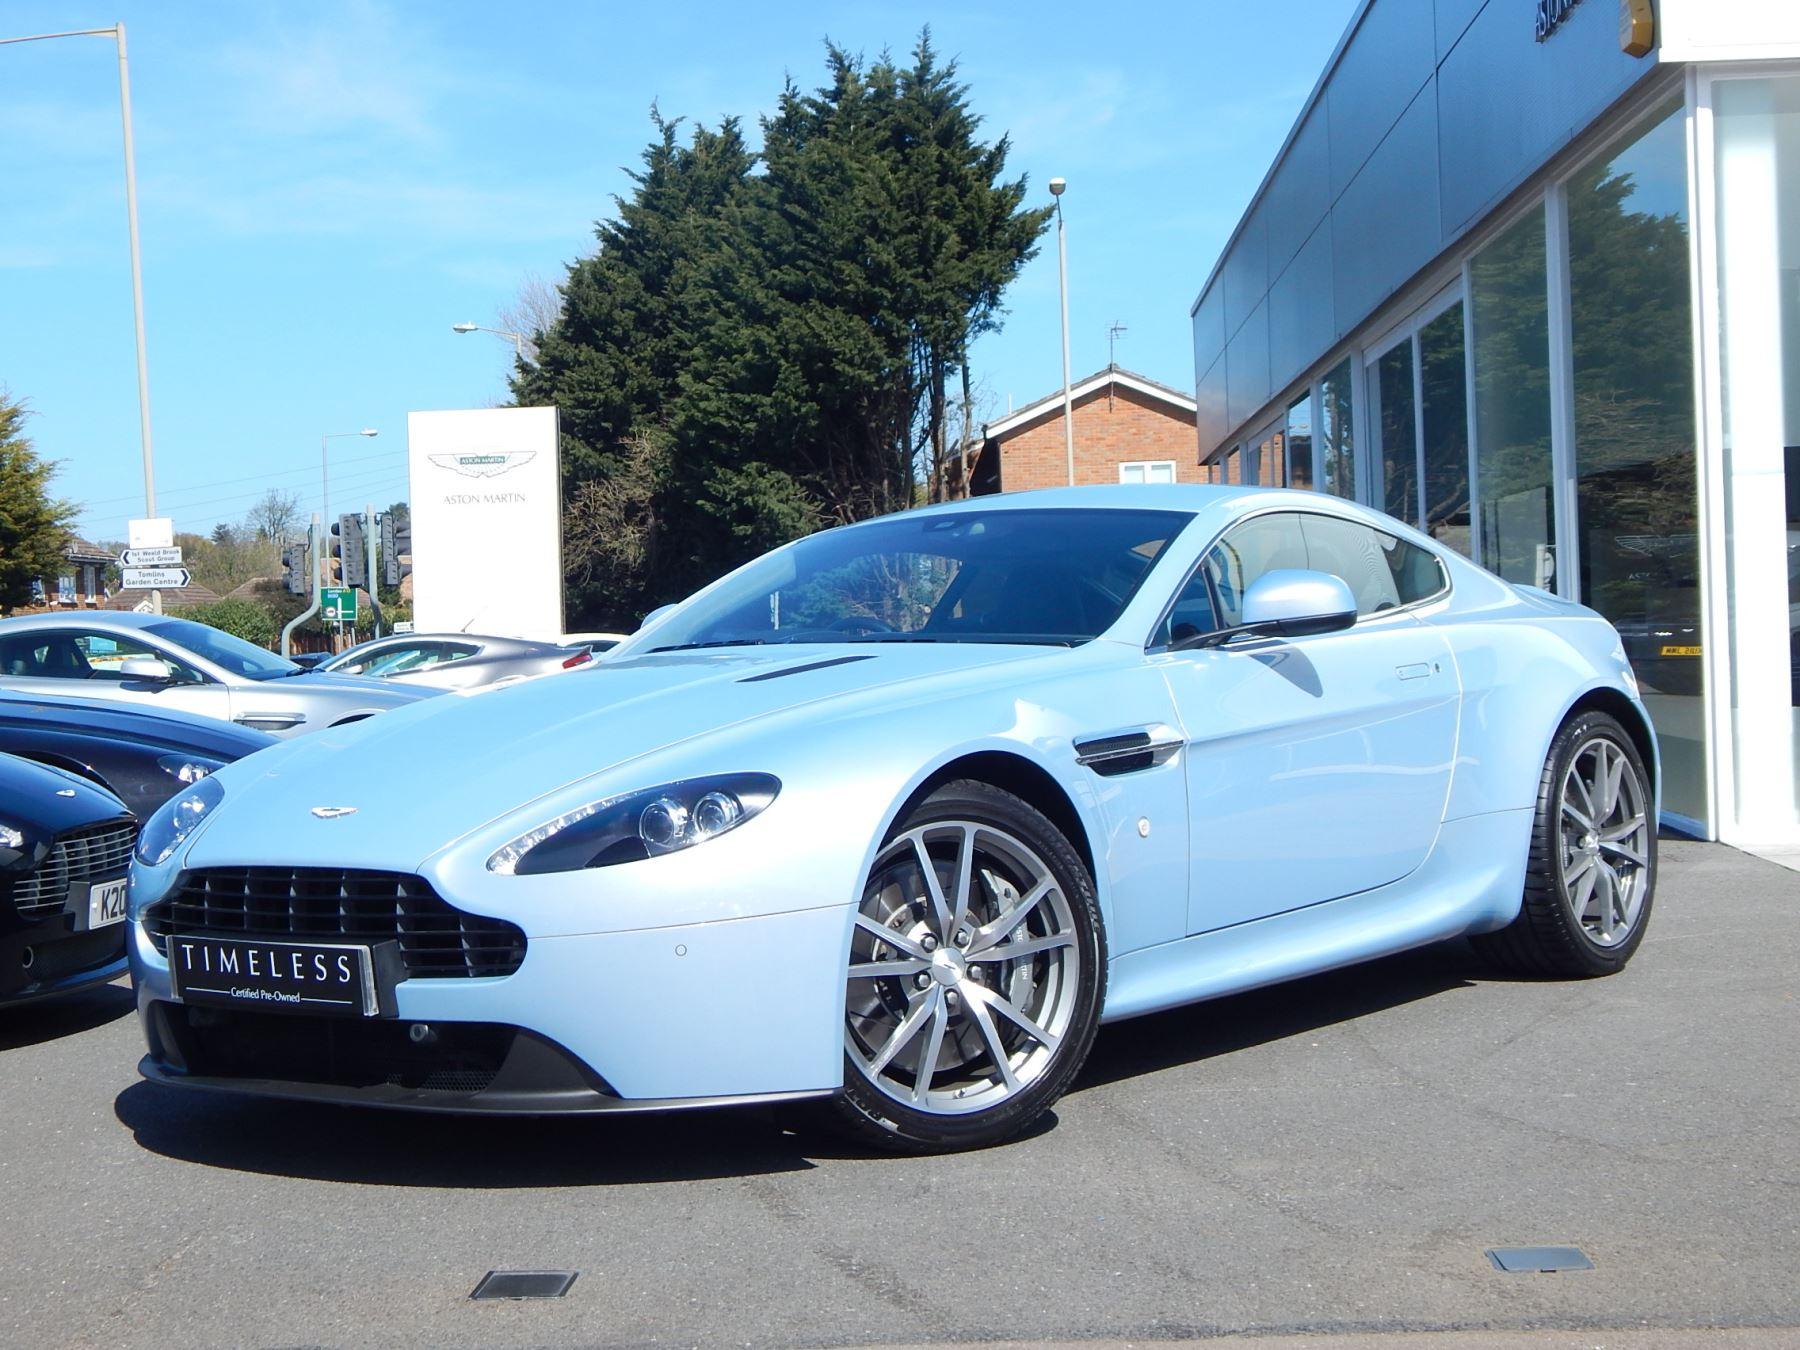 Aston Martin V8 Vantage Coupe V8 4.7 Coupe Sports Shift 2 door (2014) image